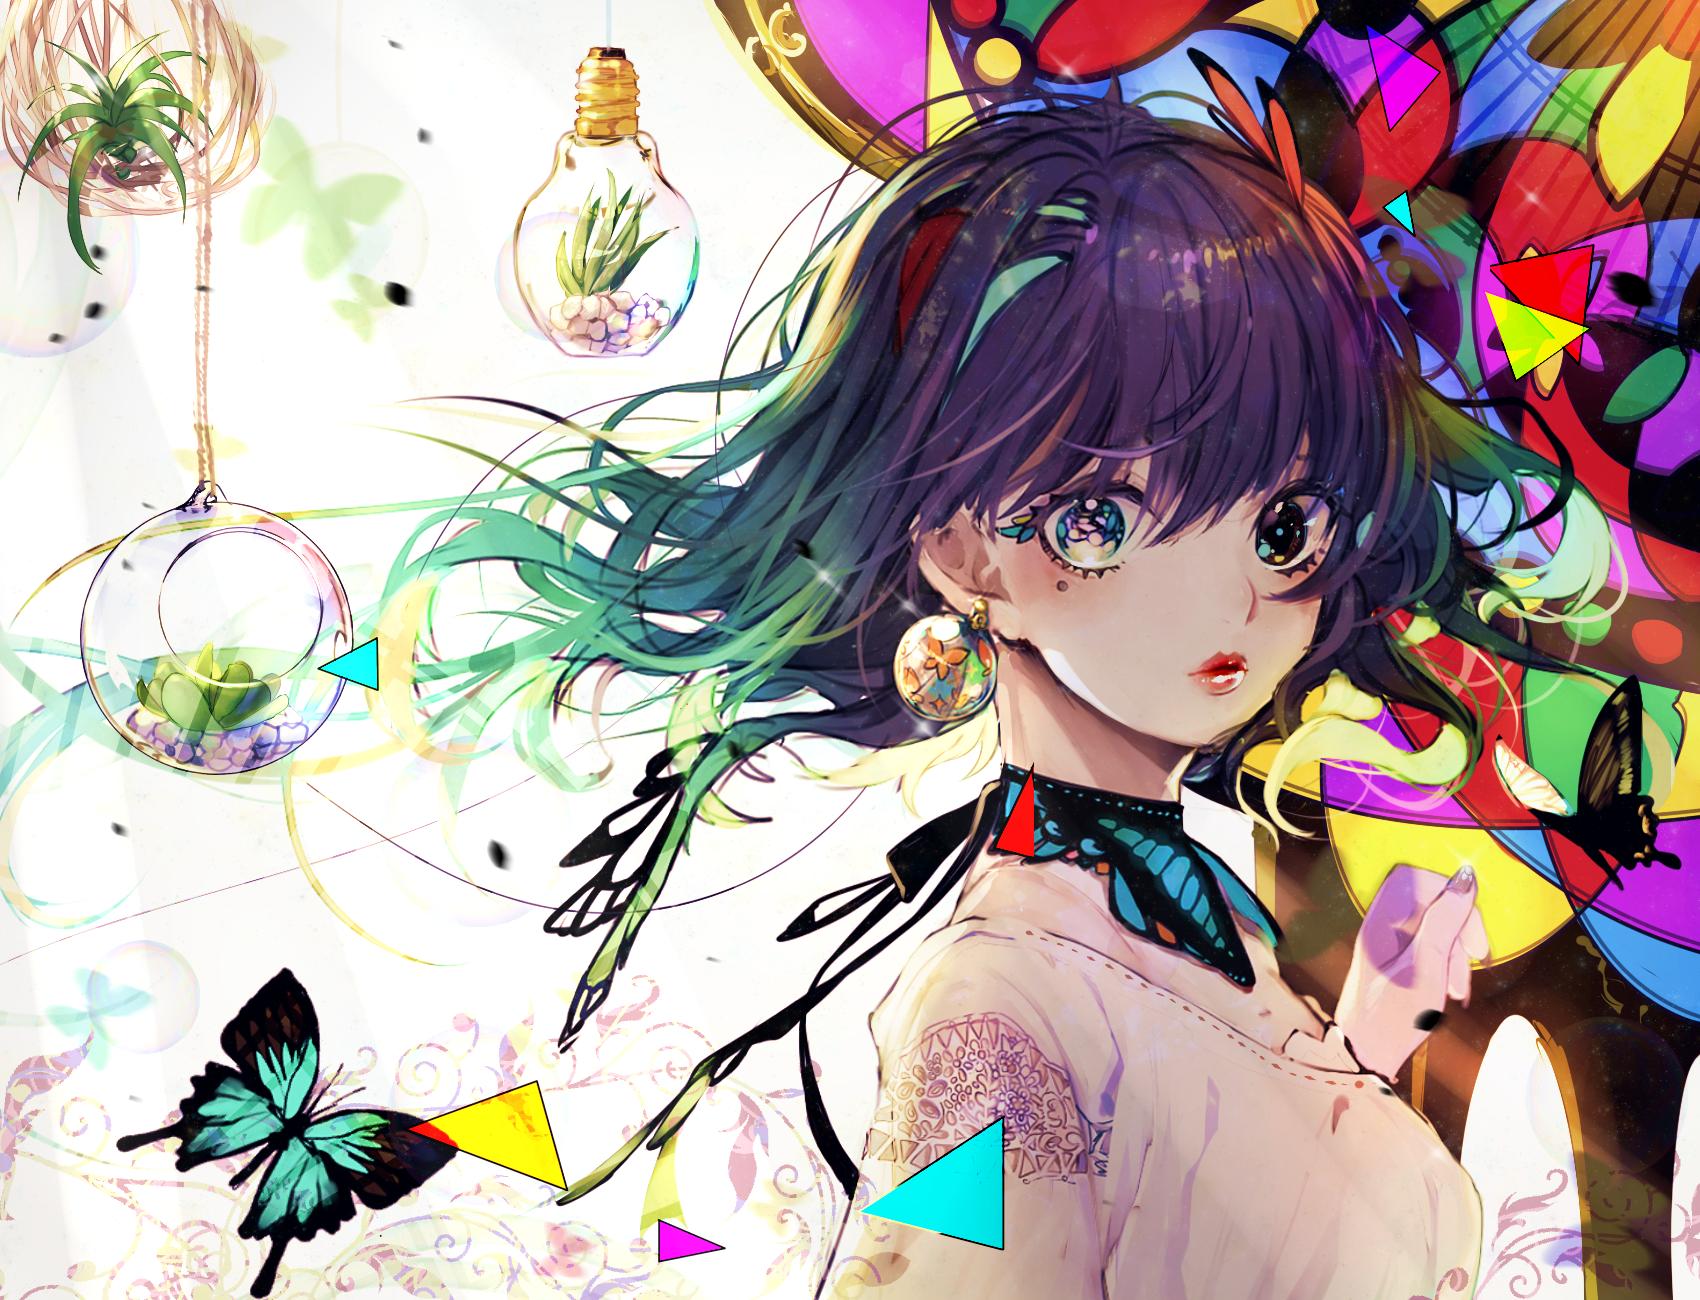 color大魔王るあえるのイラスト Pixiv Anime Girl